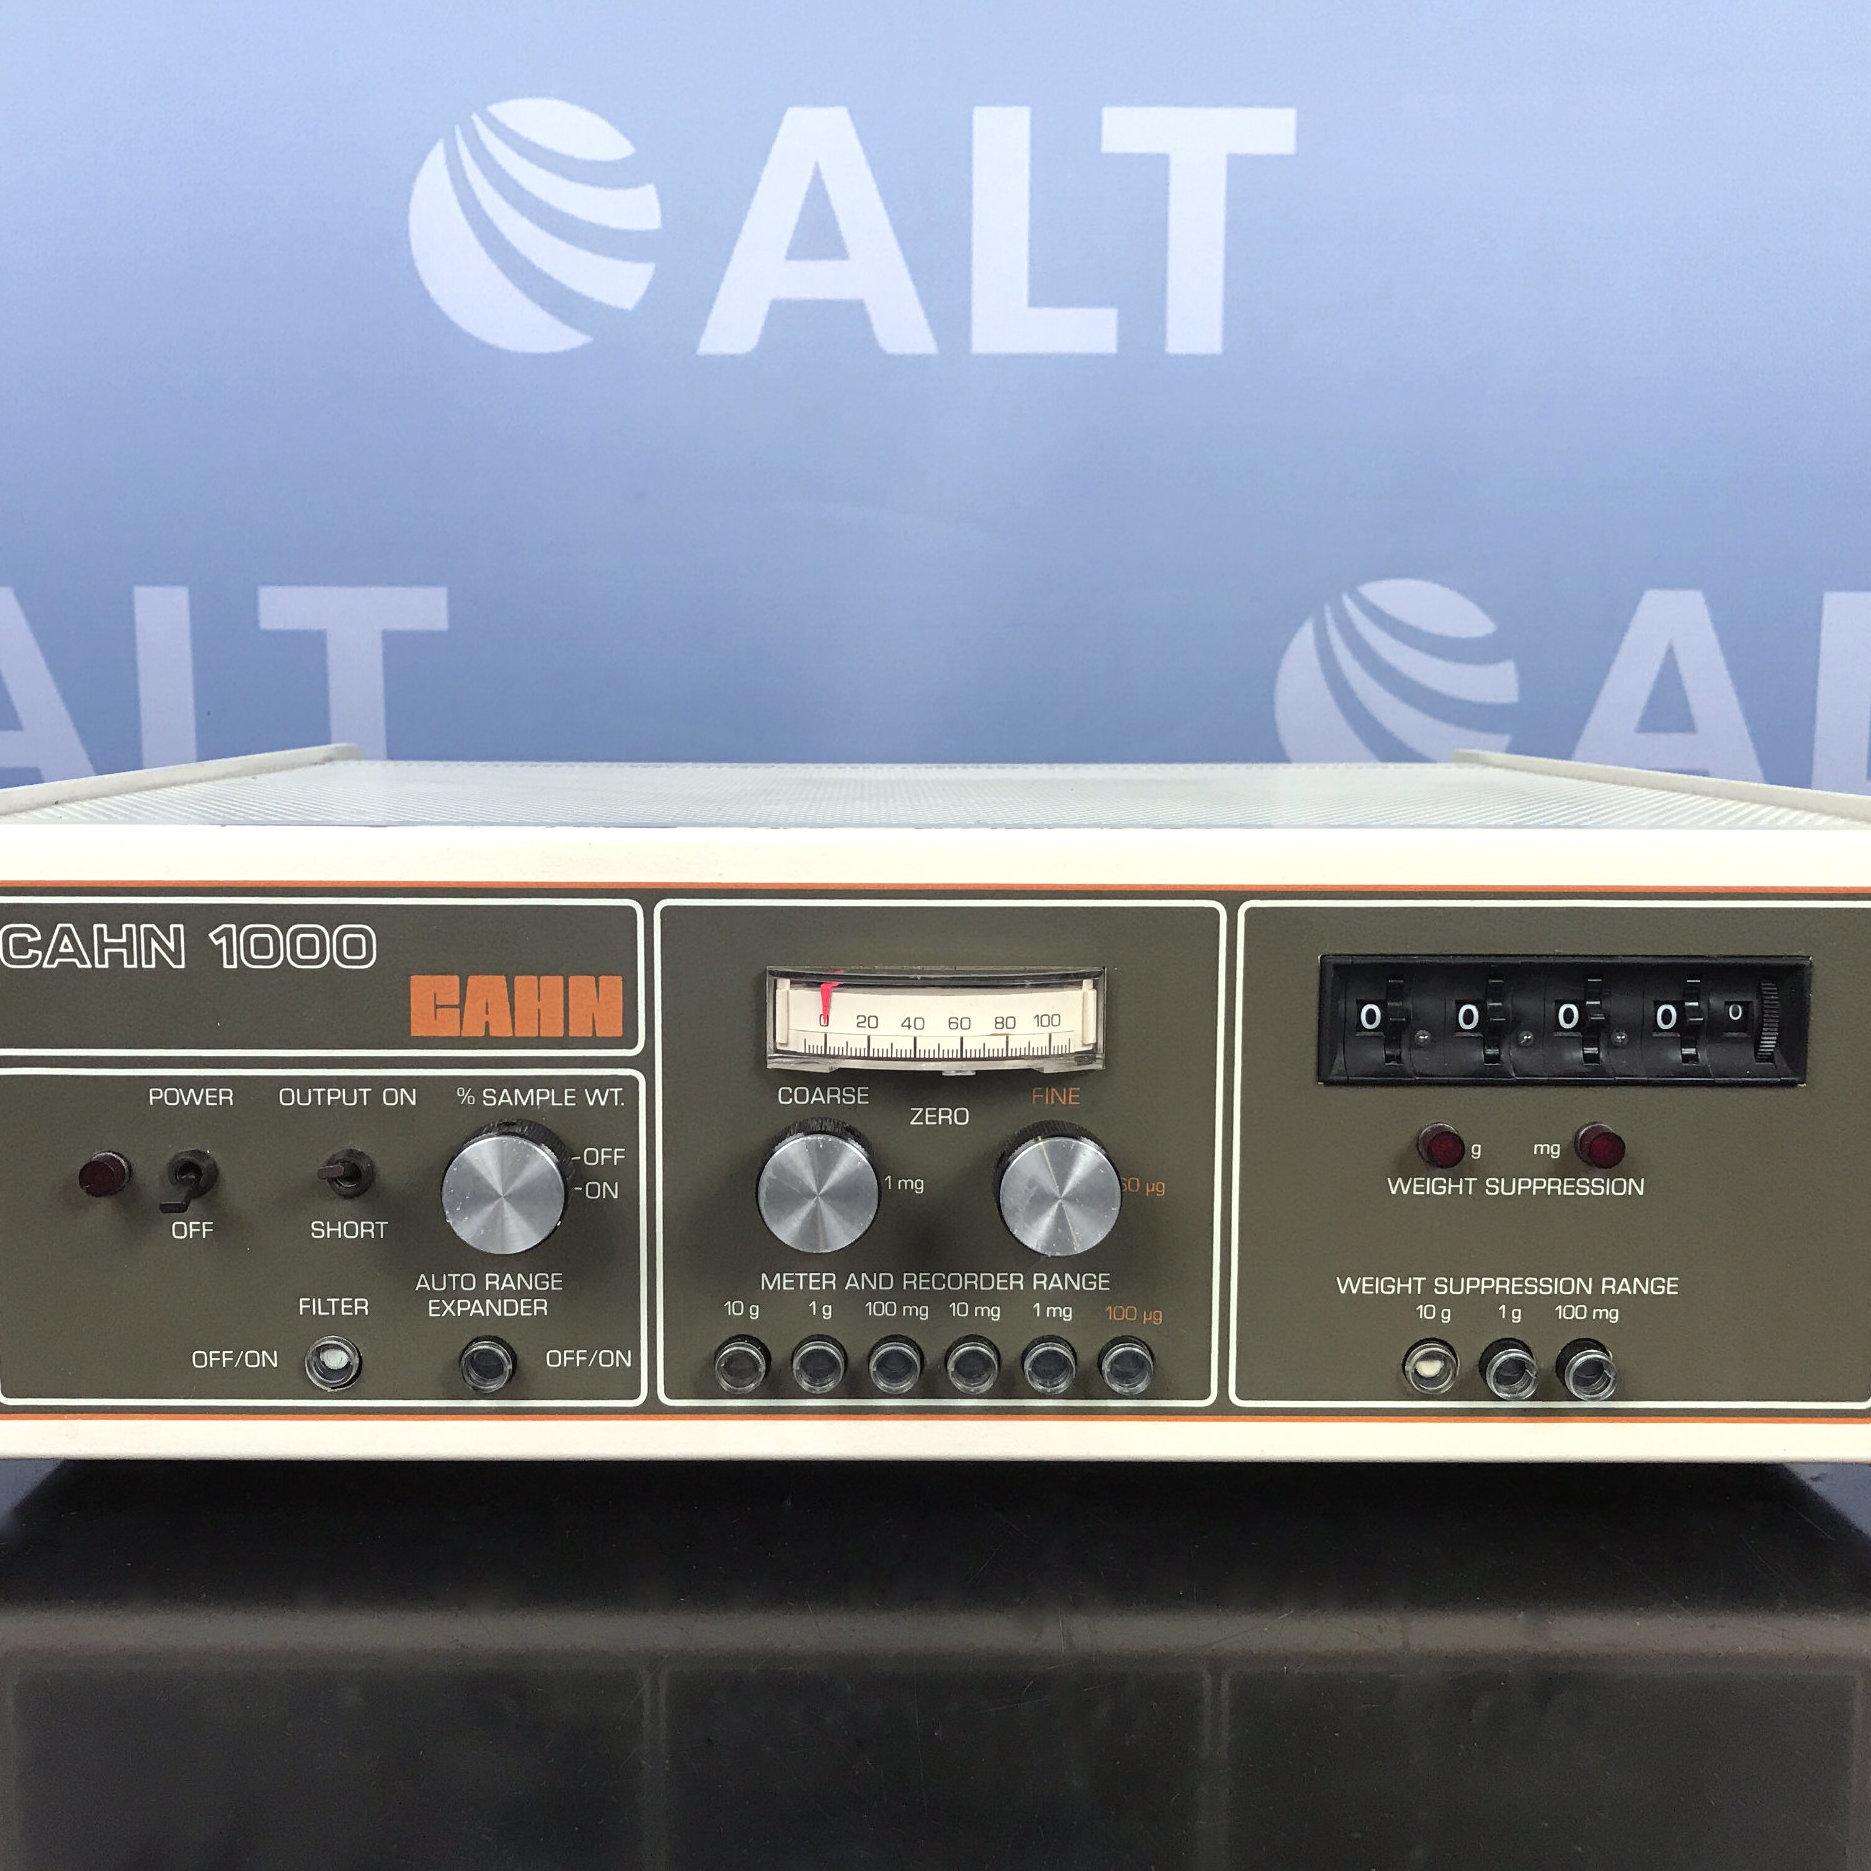 1000 Microelectronic Balance  Name